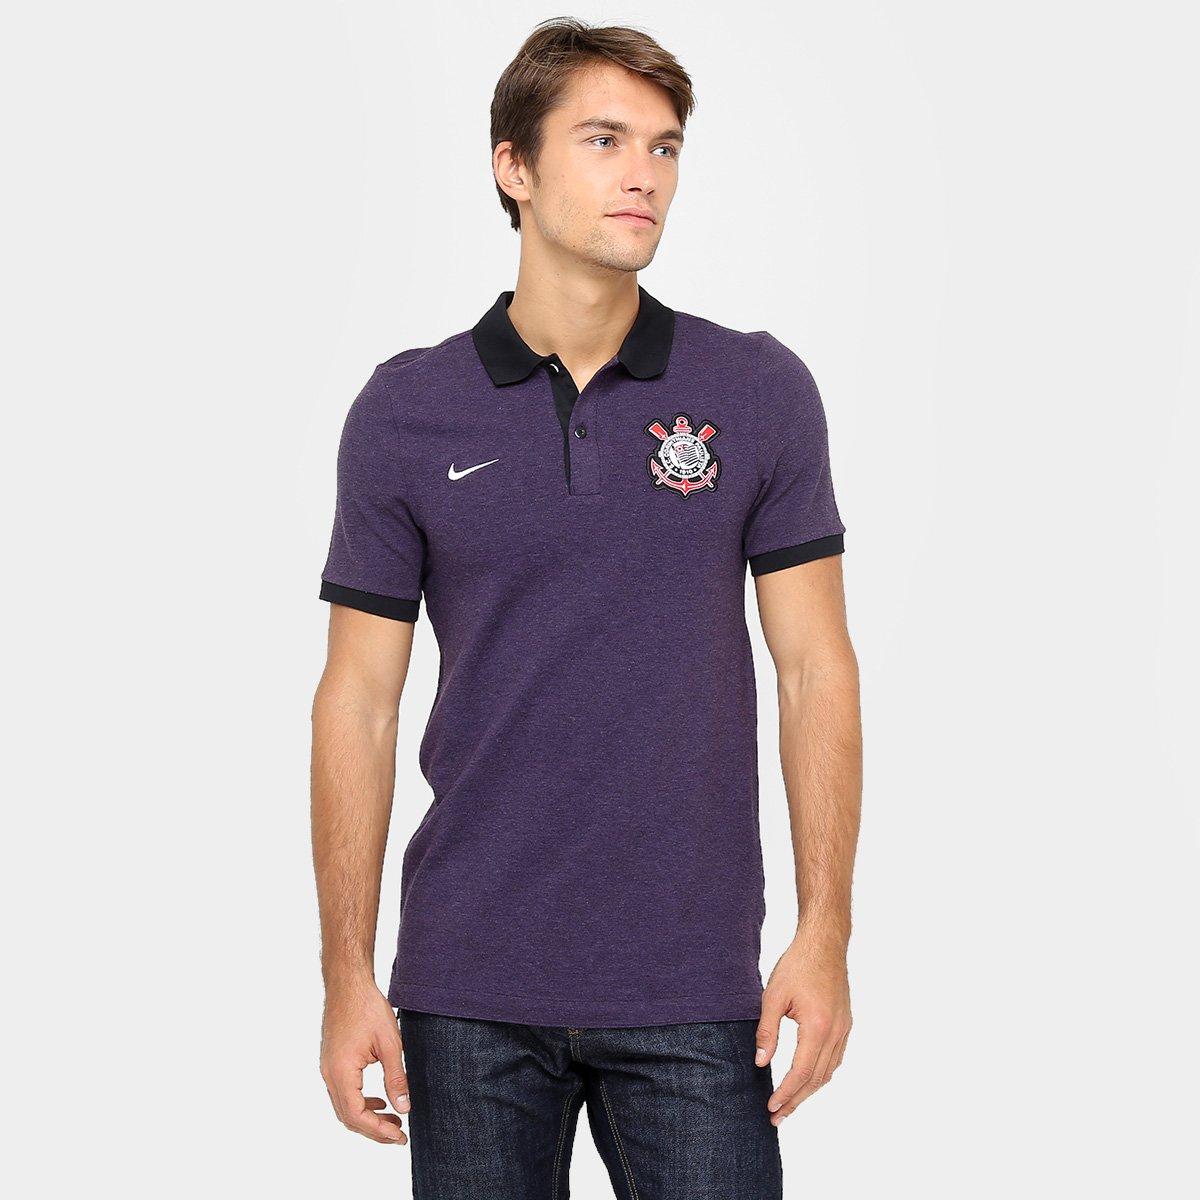 Camisa Polo Corinthians Nike Masculina - Compre Agora  9c213a89638b8